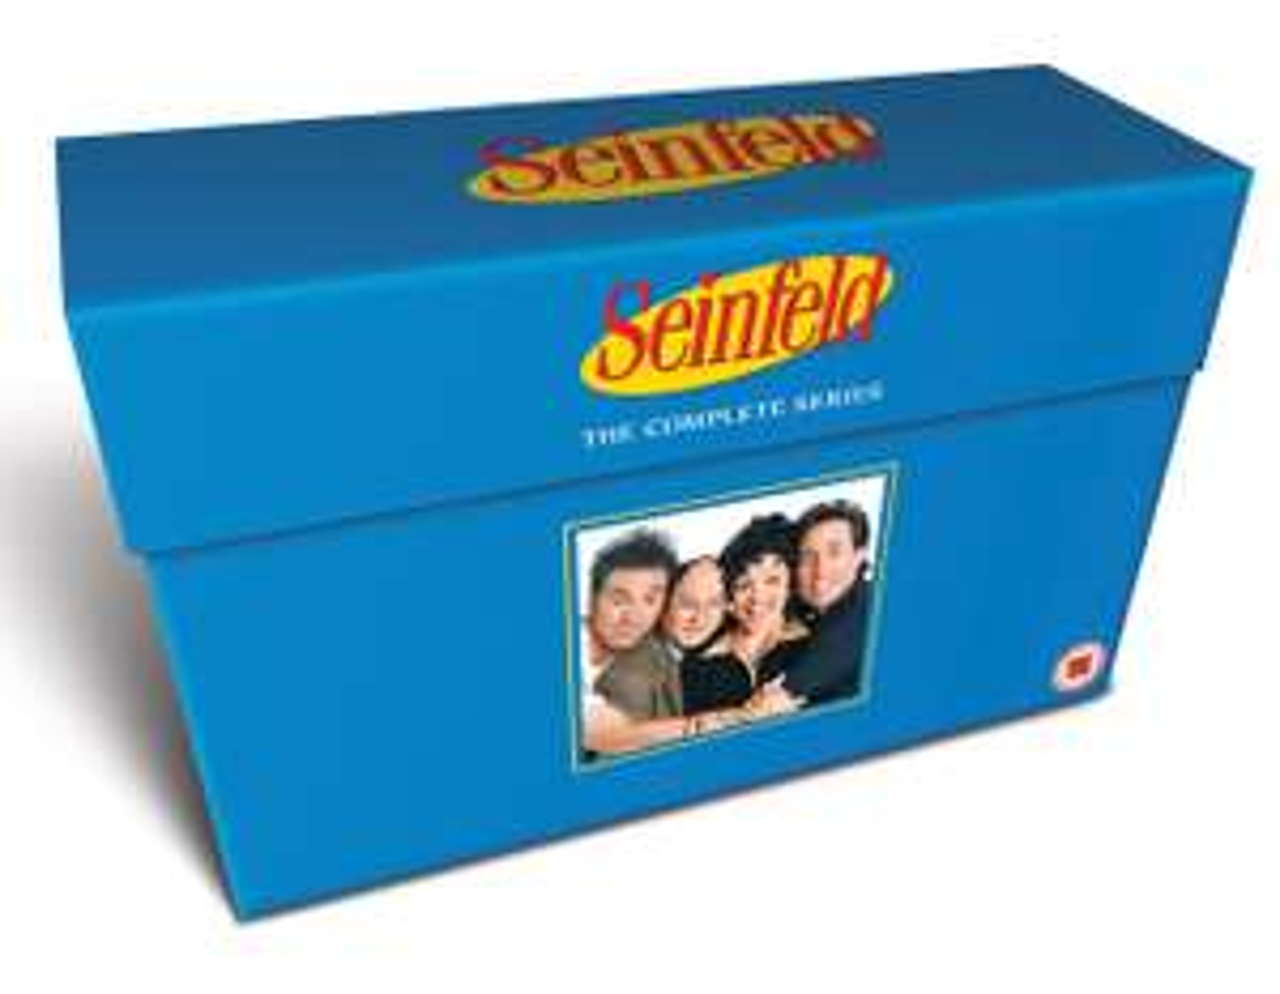 Seinfeld: The Complete Series Box Set - £29.99 @ HMV